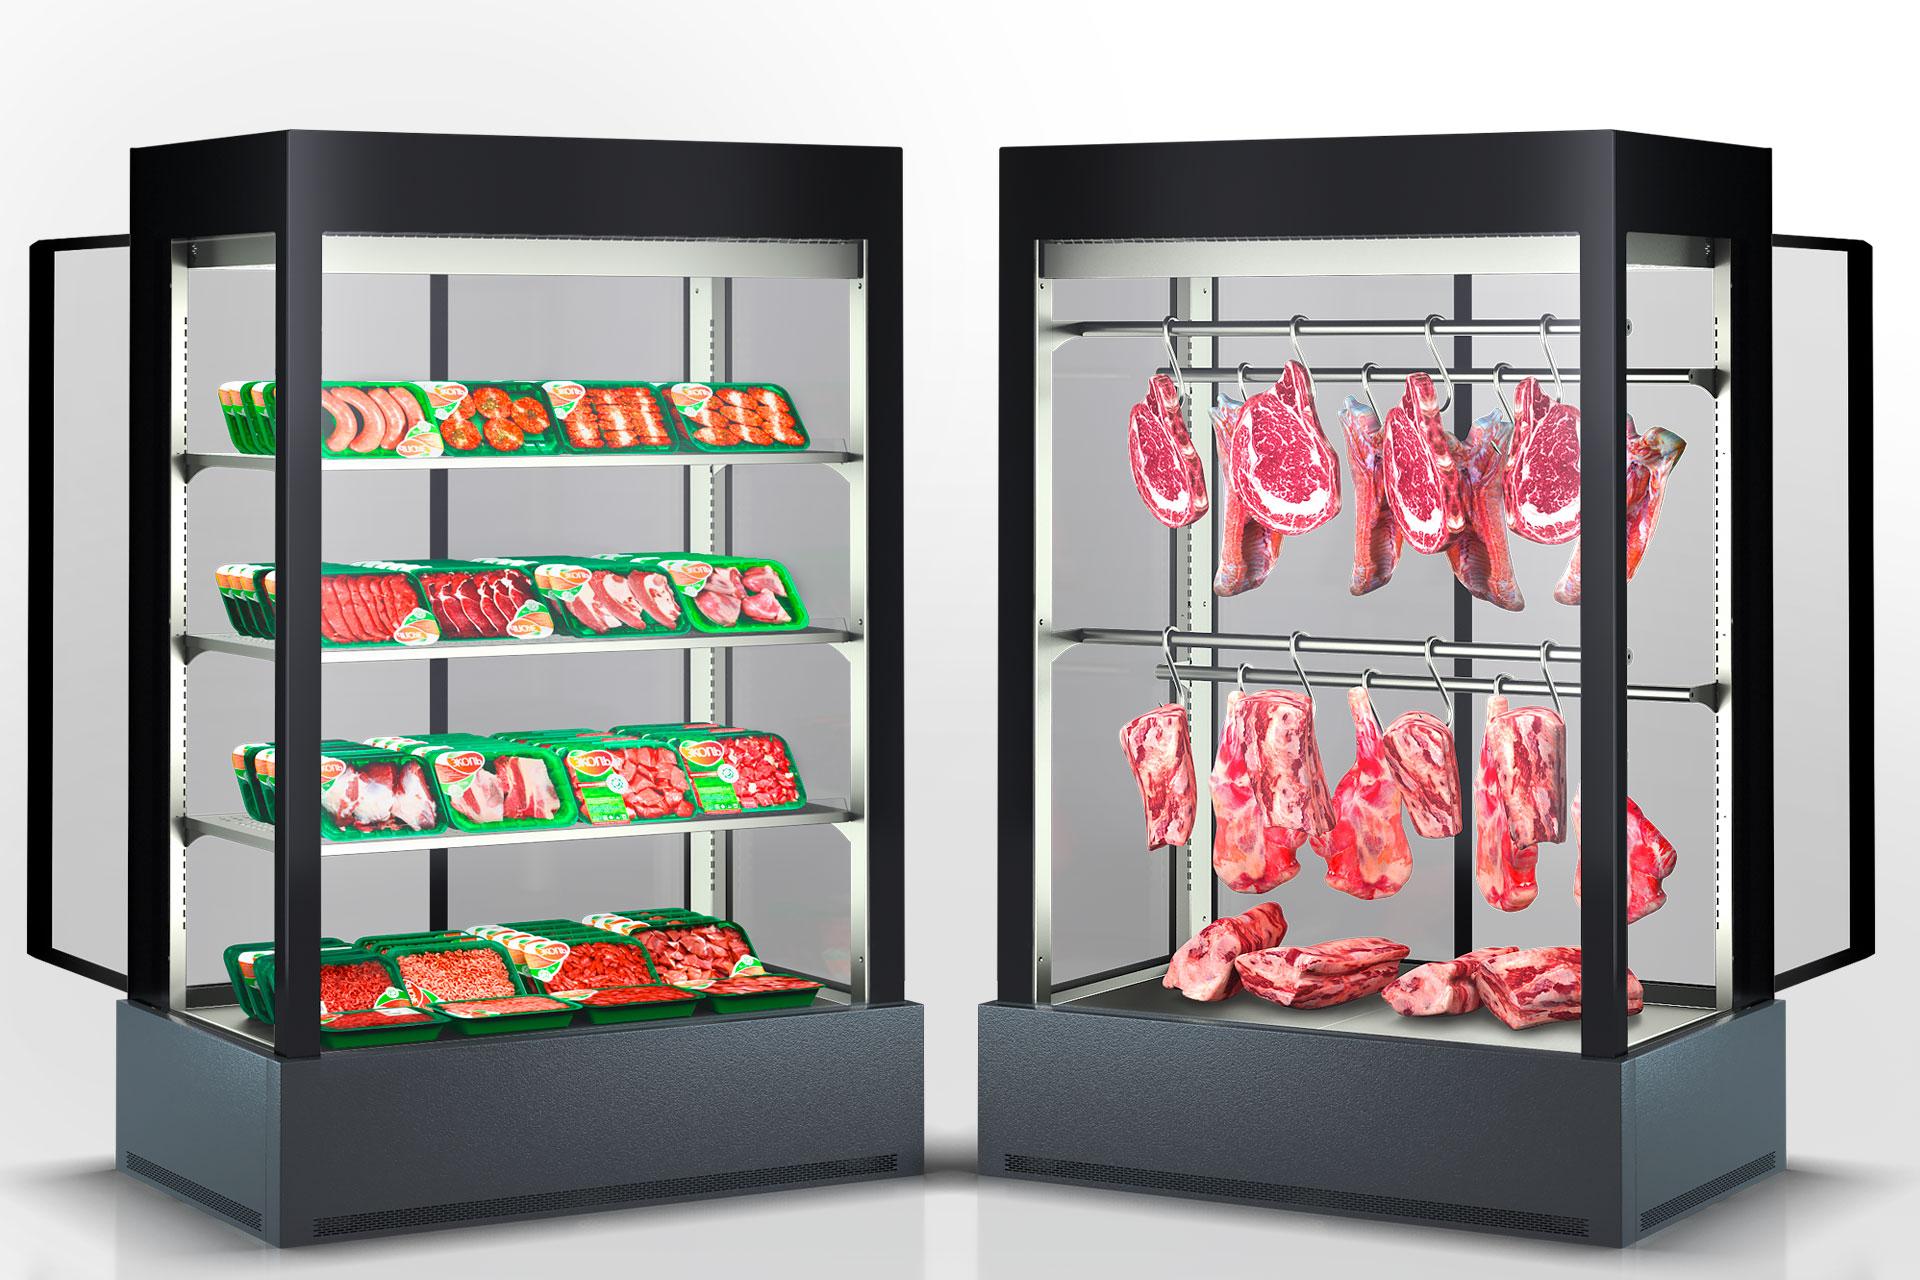 Холодильные шкафы Kansas А4SG 078 meat 2HD 210-S1000A-135